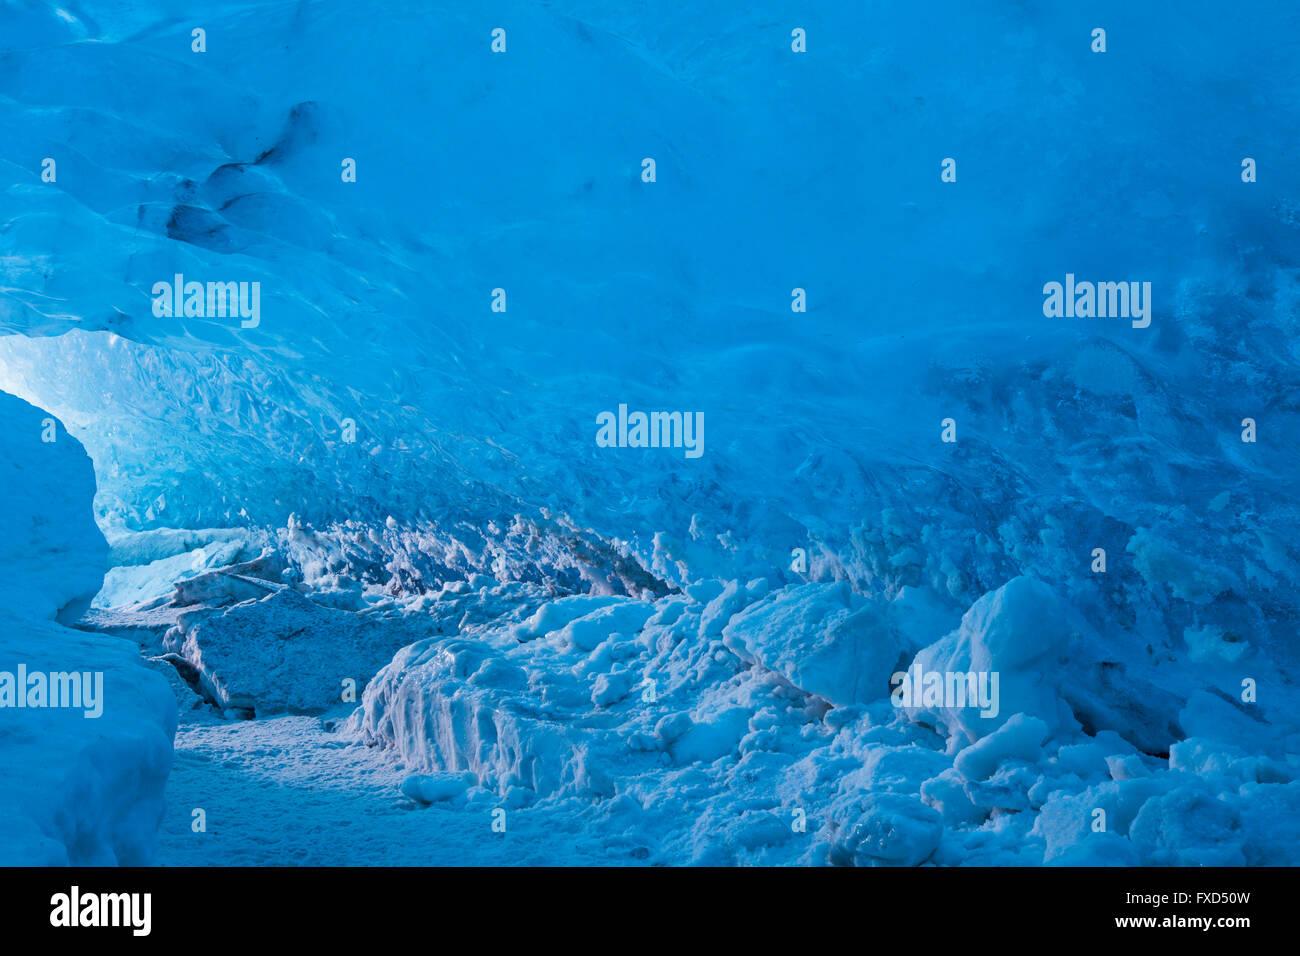 Hielo azul en el interior de la caverna de hielo glaciar Breidamerkurjokull, salida de Vatnajökull / Vatna glaciar en Islandia Foto de stock